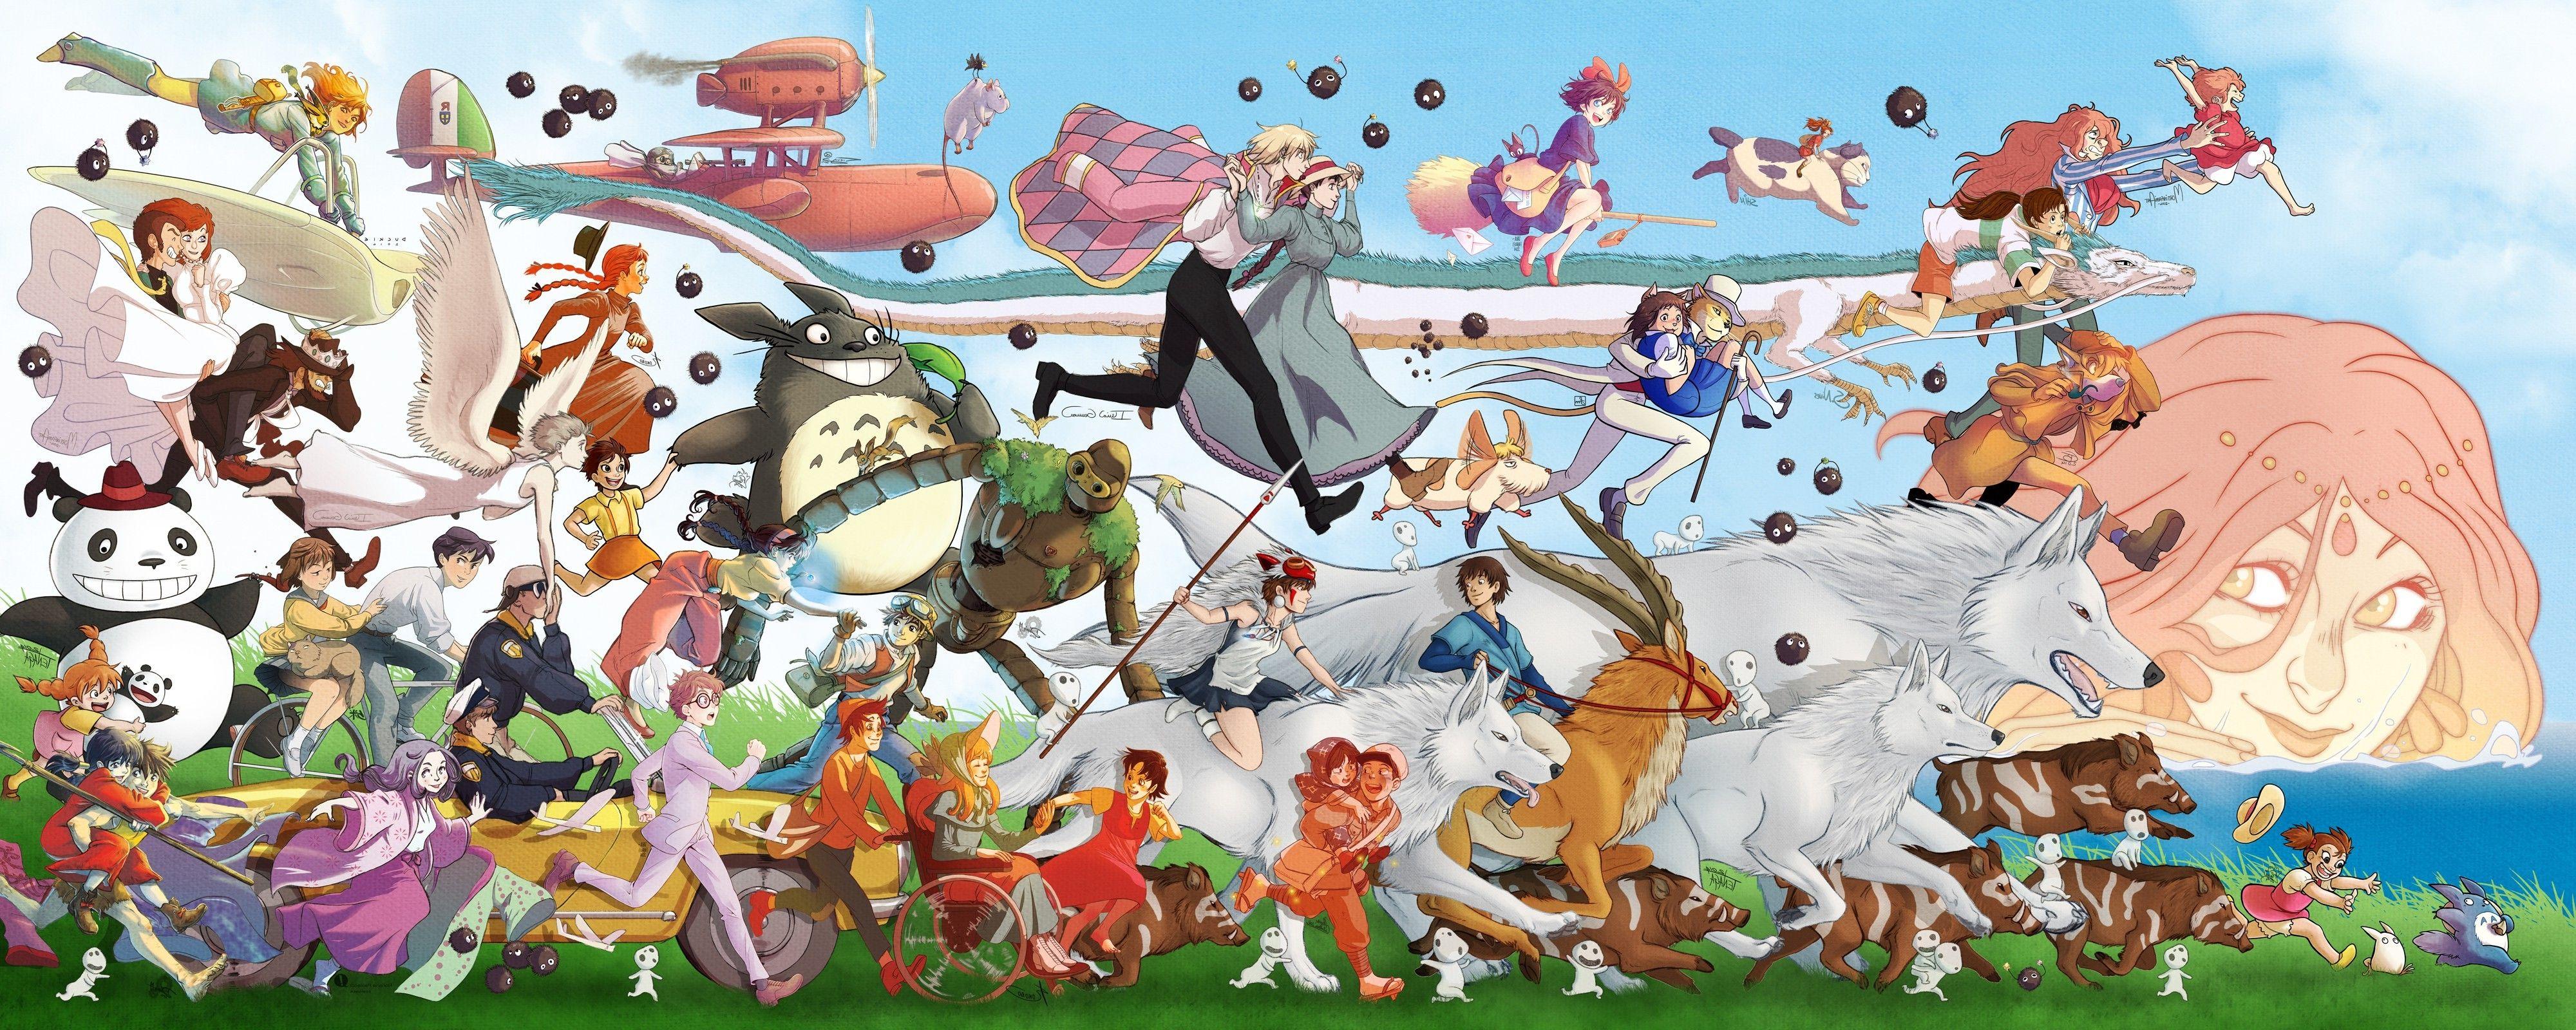 Download Hd Wallpapers Of 38783 Studio Ghibli My Neighbor Totoro Spirited Away Castle In The Anime Art Beautiful Hayao Miyazaki Art Studio Ghibli Characters